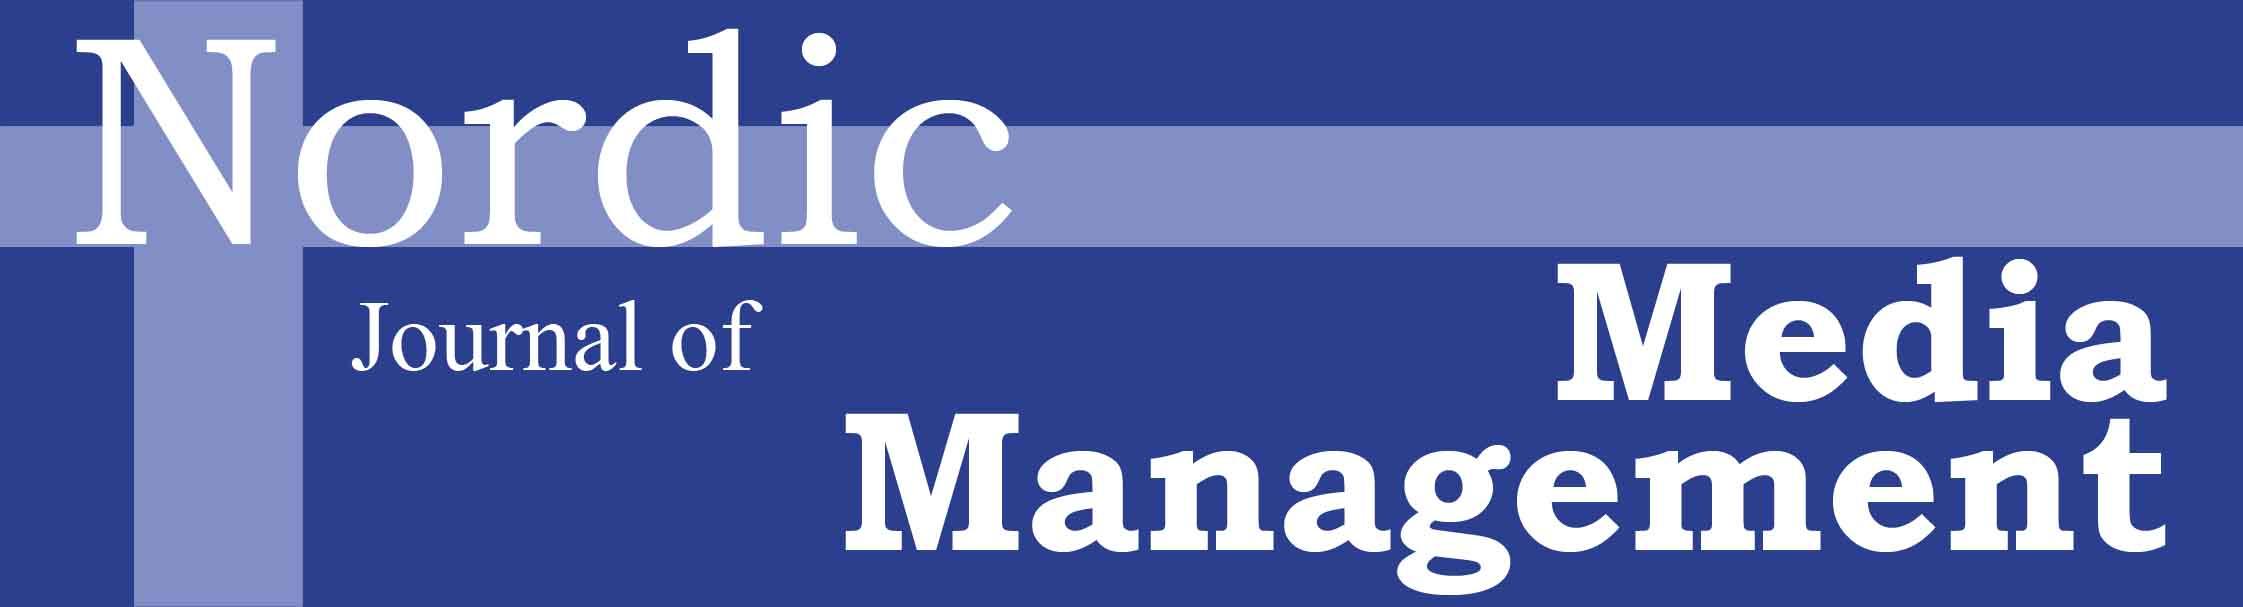 Nordic Journal of Media Management